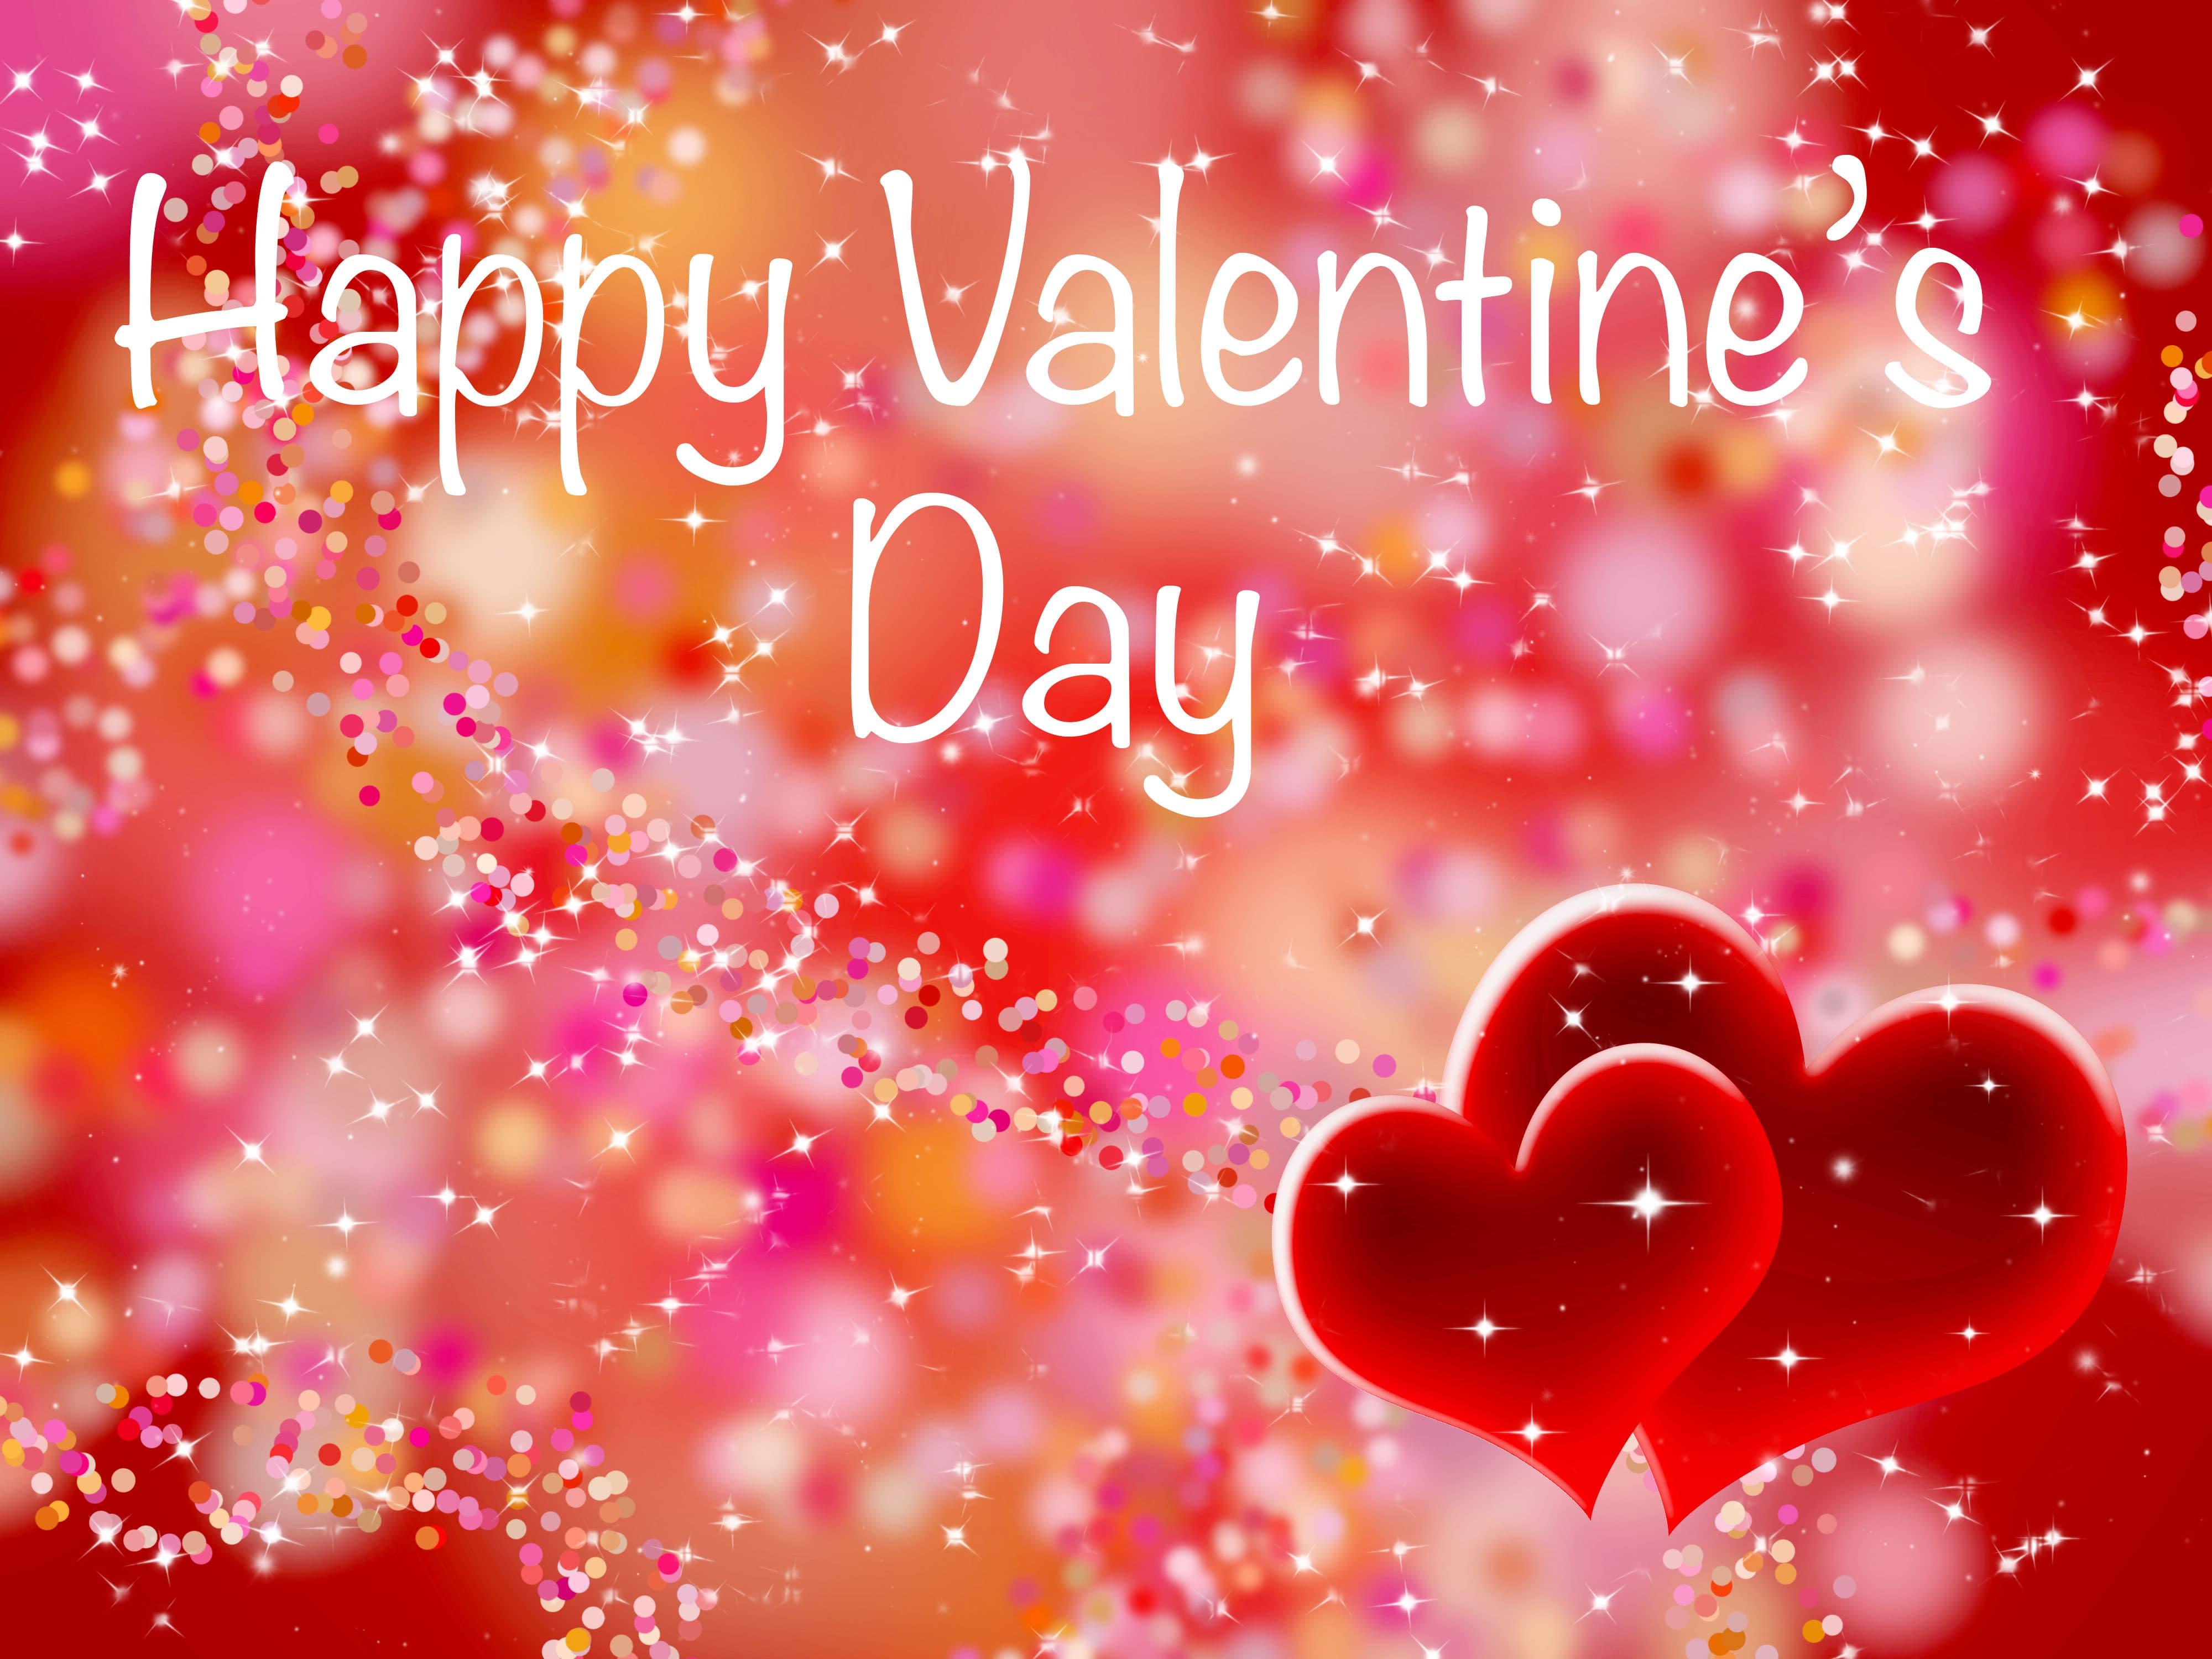 Valentine's Day HD pics